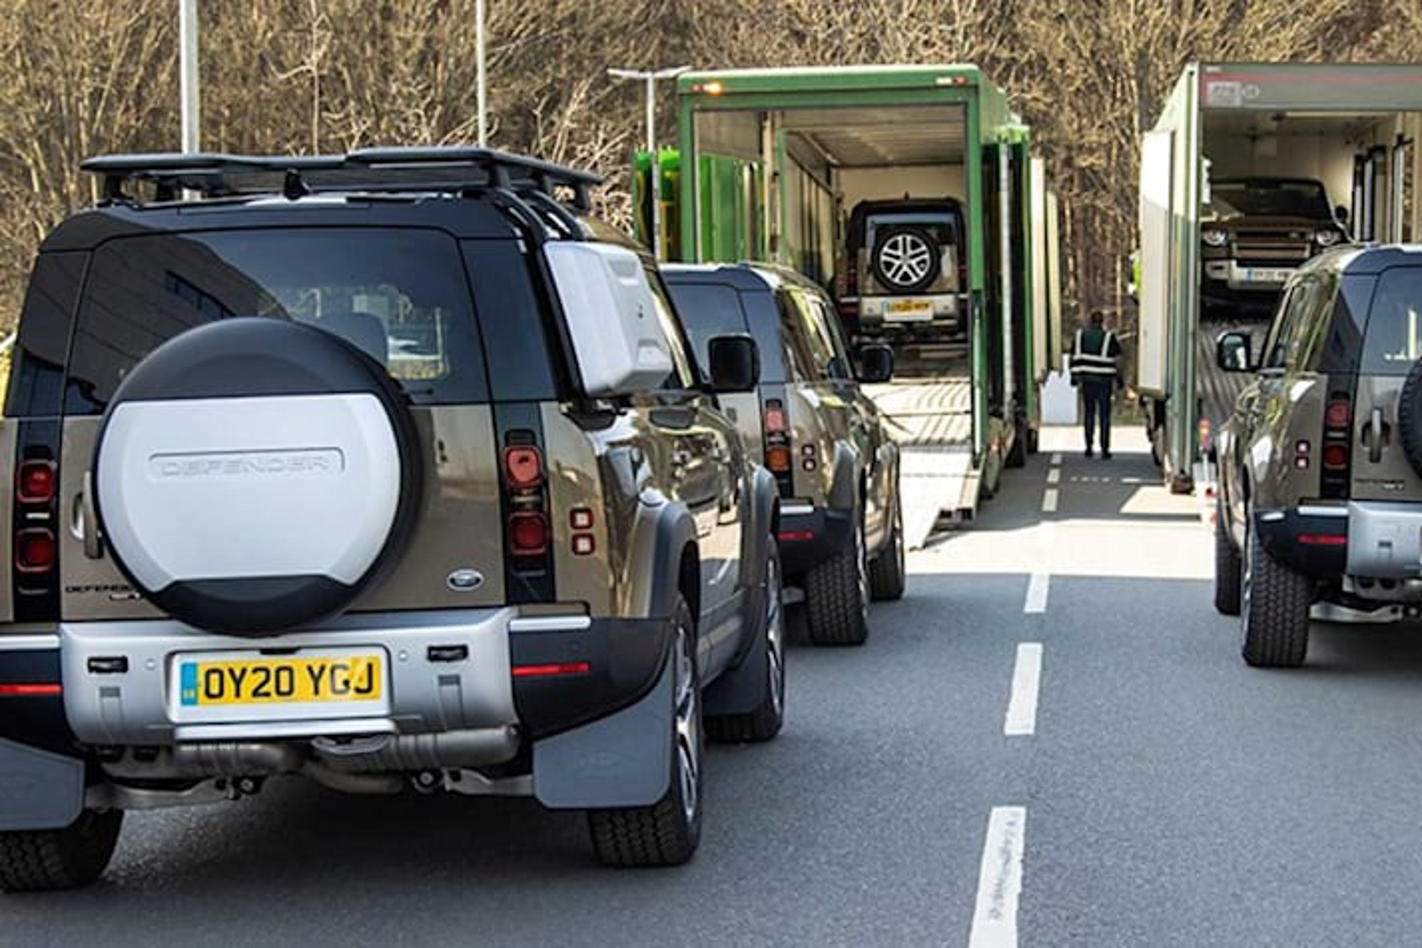 Land Rover lends models coronavirus